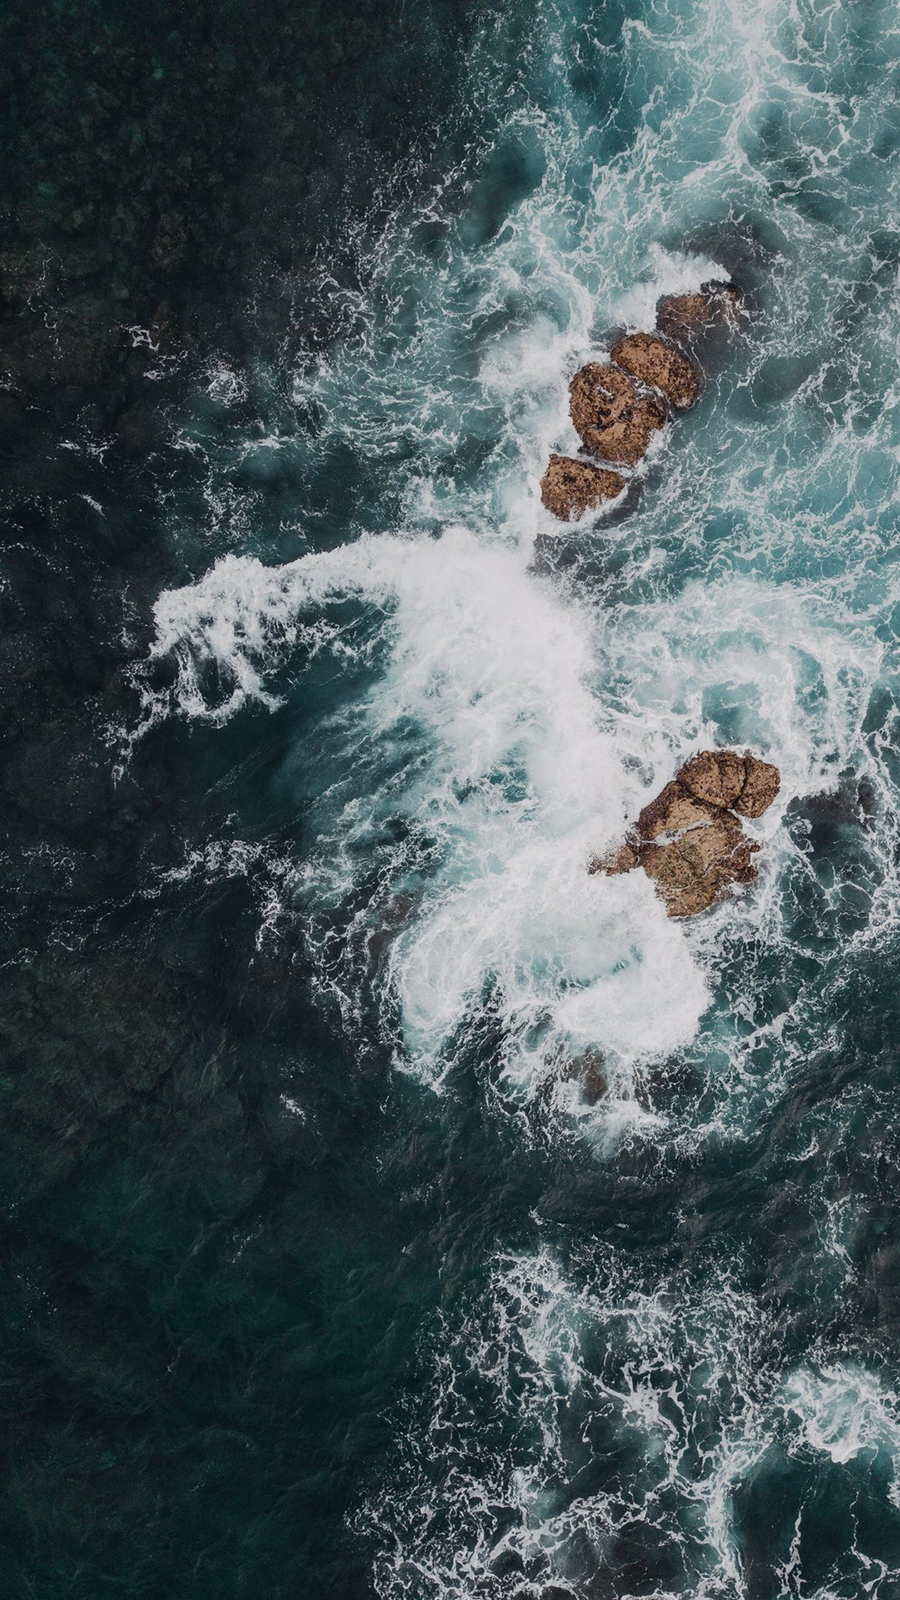 Nature Wallpaper – Sea & Nature Wallpapers Free Download